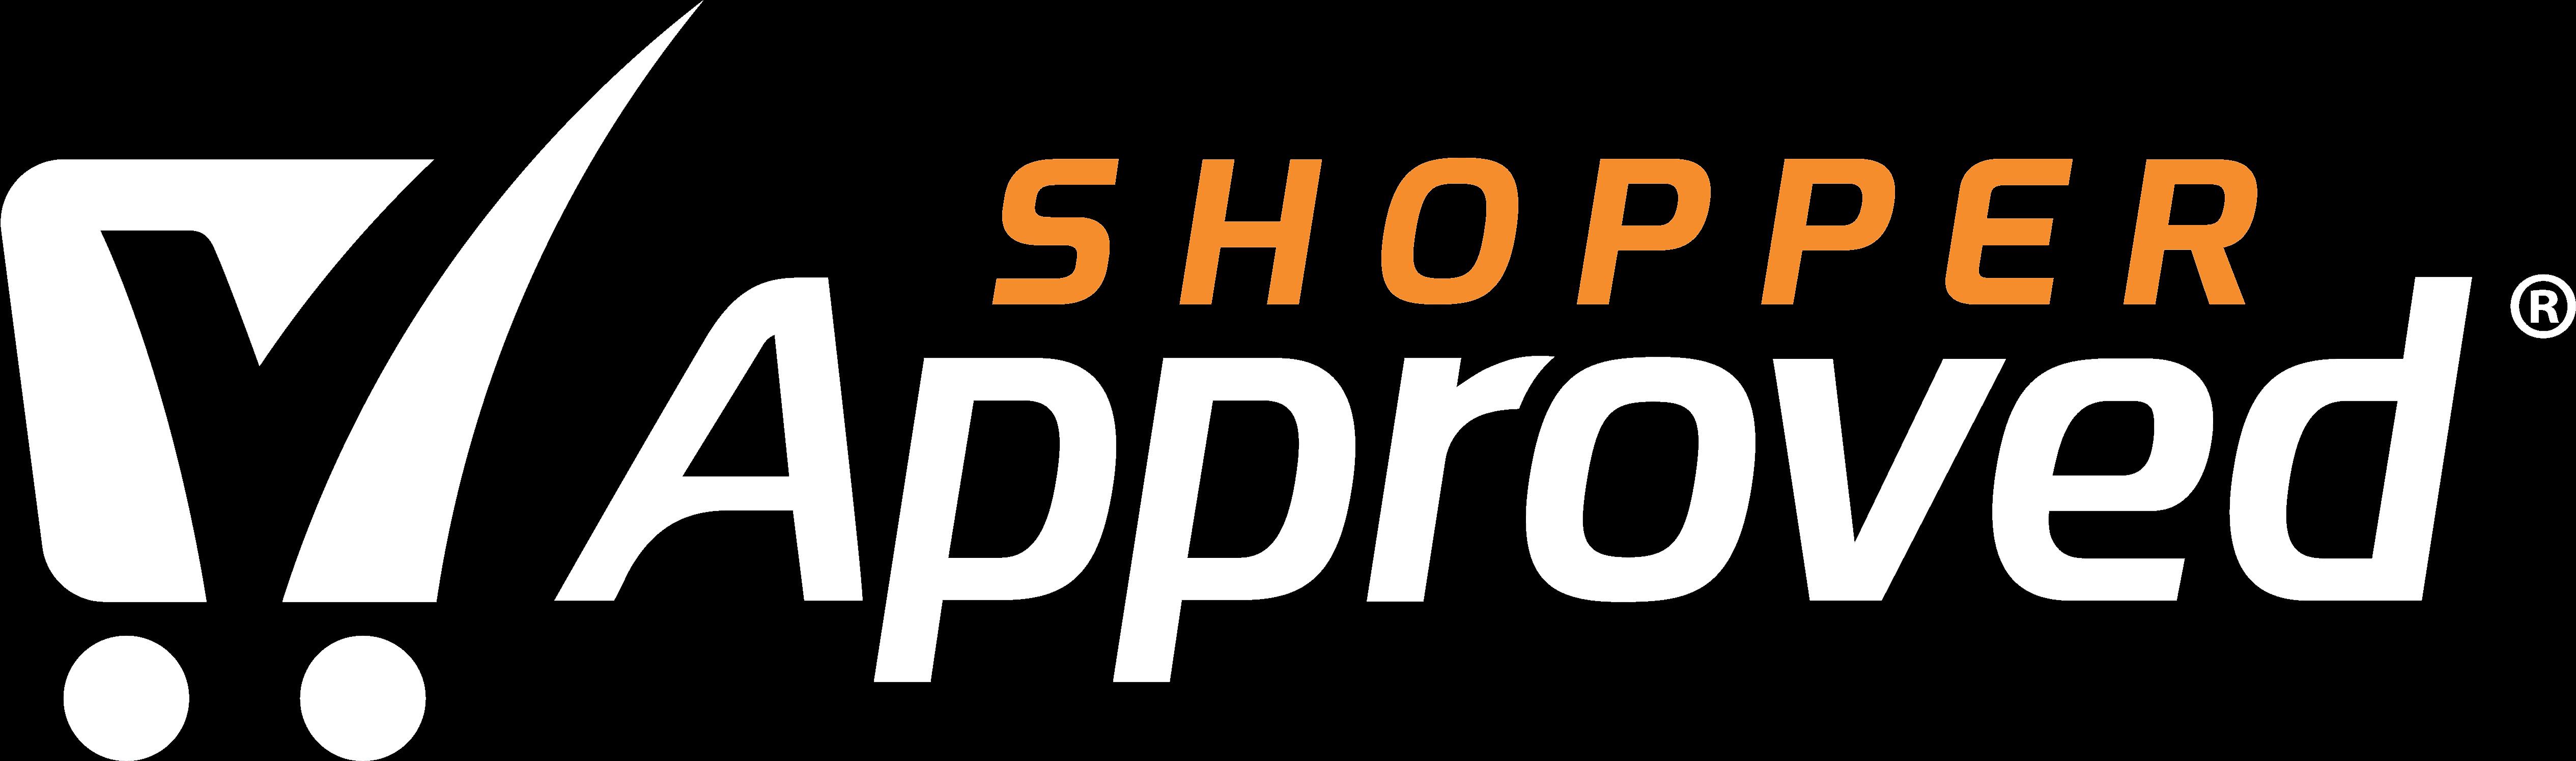 shopper-approved-logo